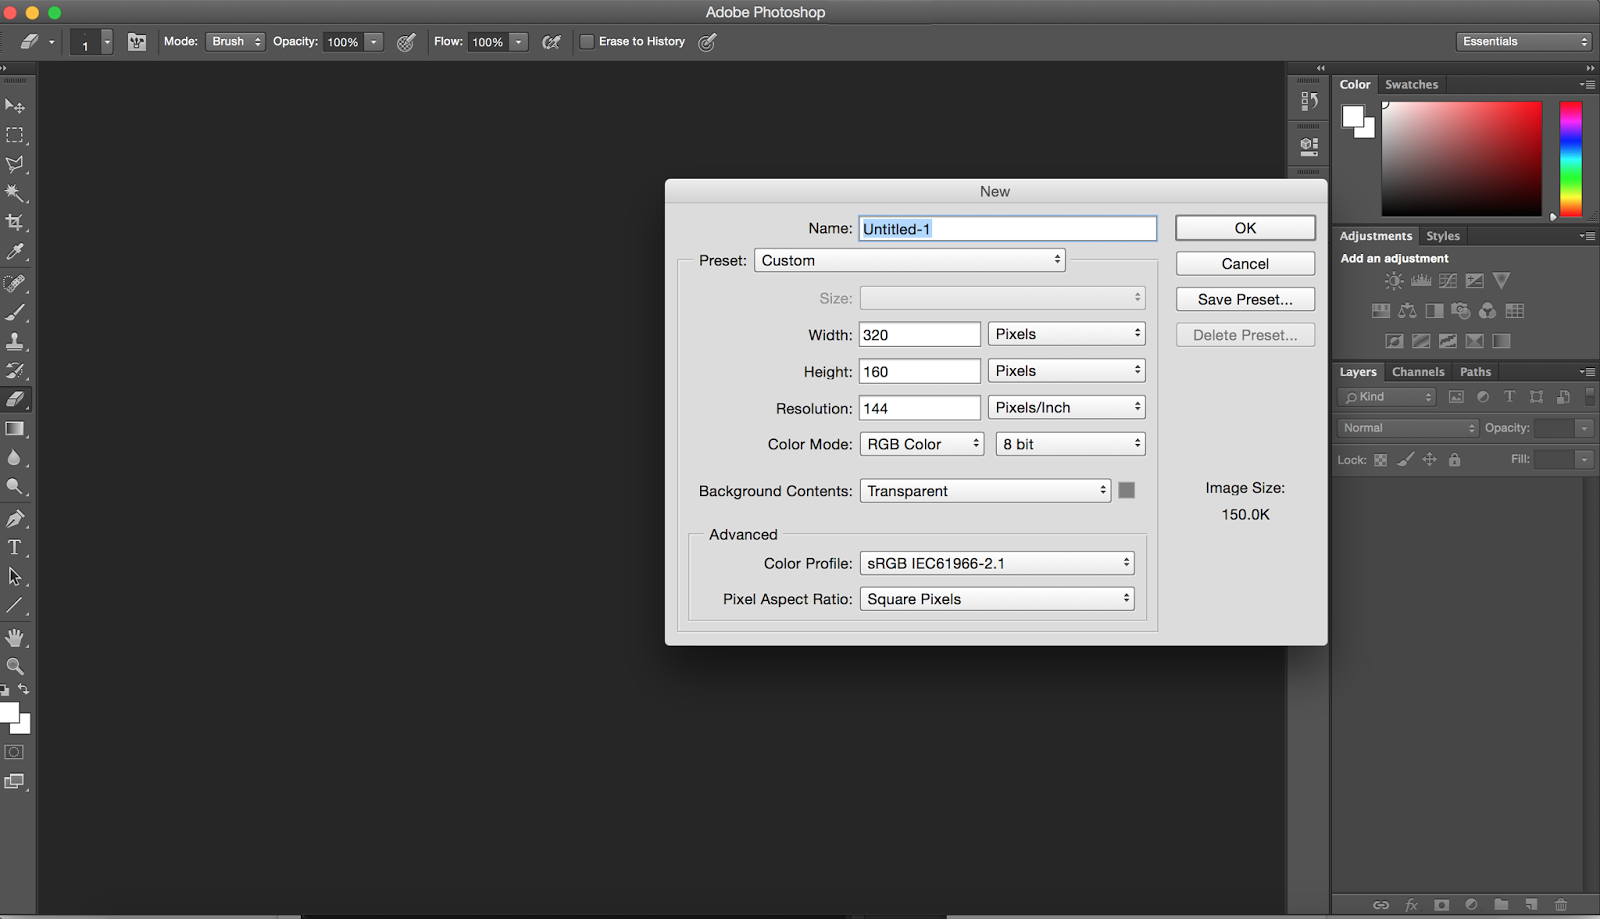 Free download adobe photoshop cs3 for mac os x 10.4.11 mac os x 10 4 11